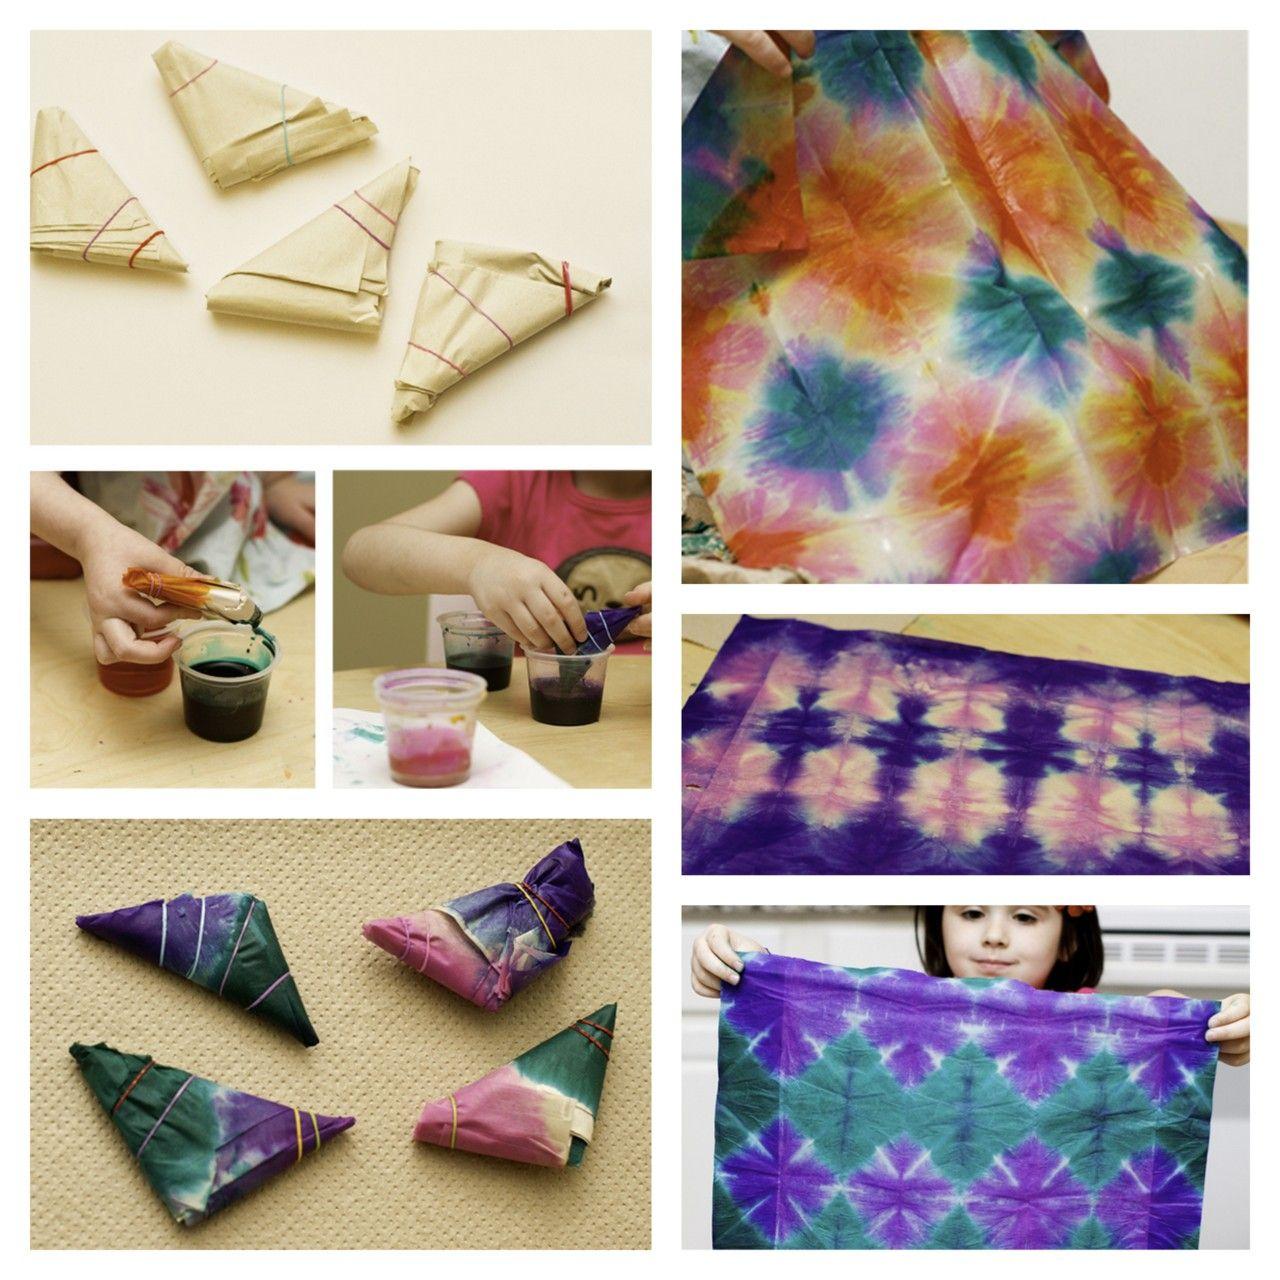 rainbowsandunicornscrafts diy tie dye tissue tie dye. Black Bedroom Furniture Sets. Home Design Ideas